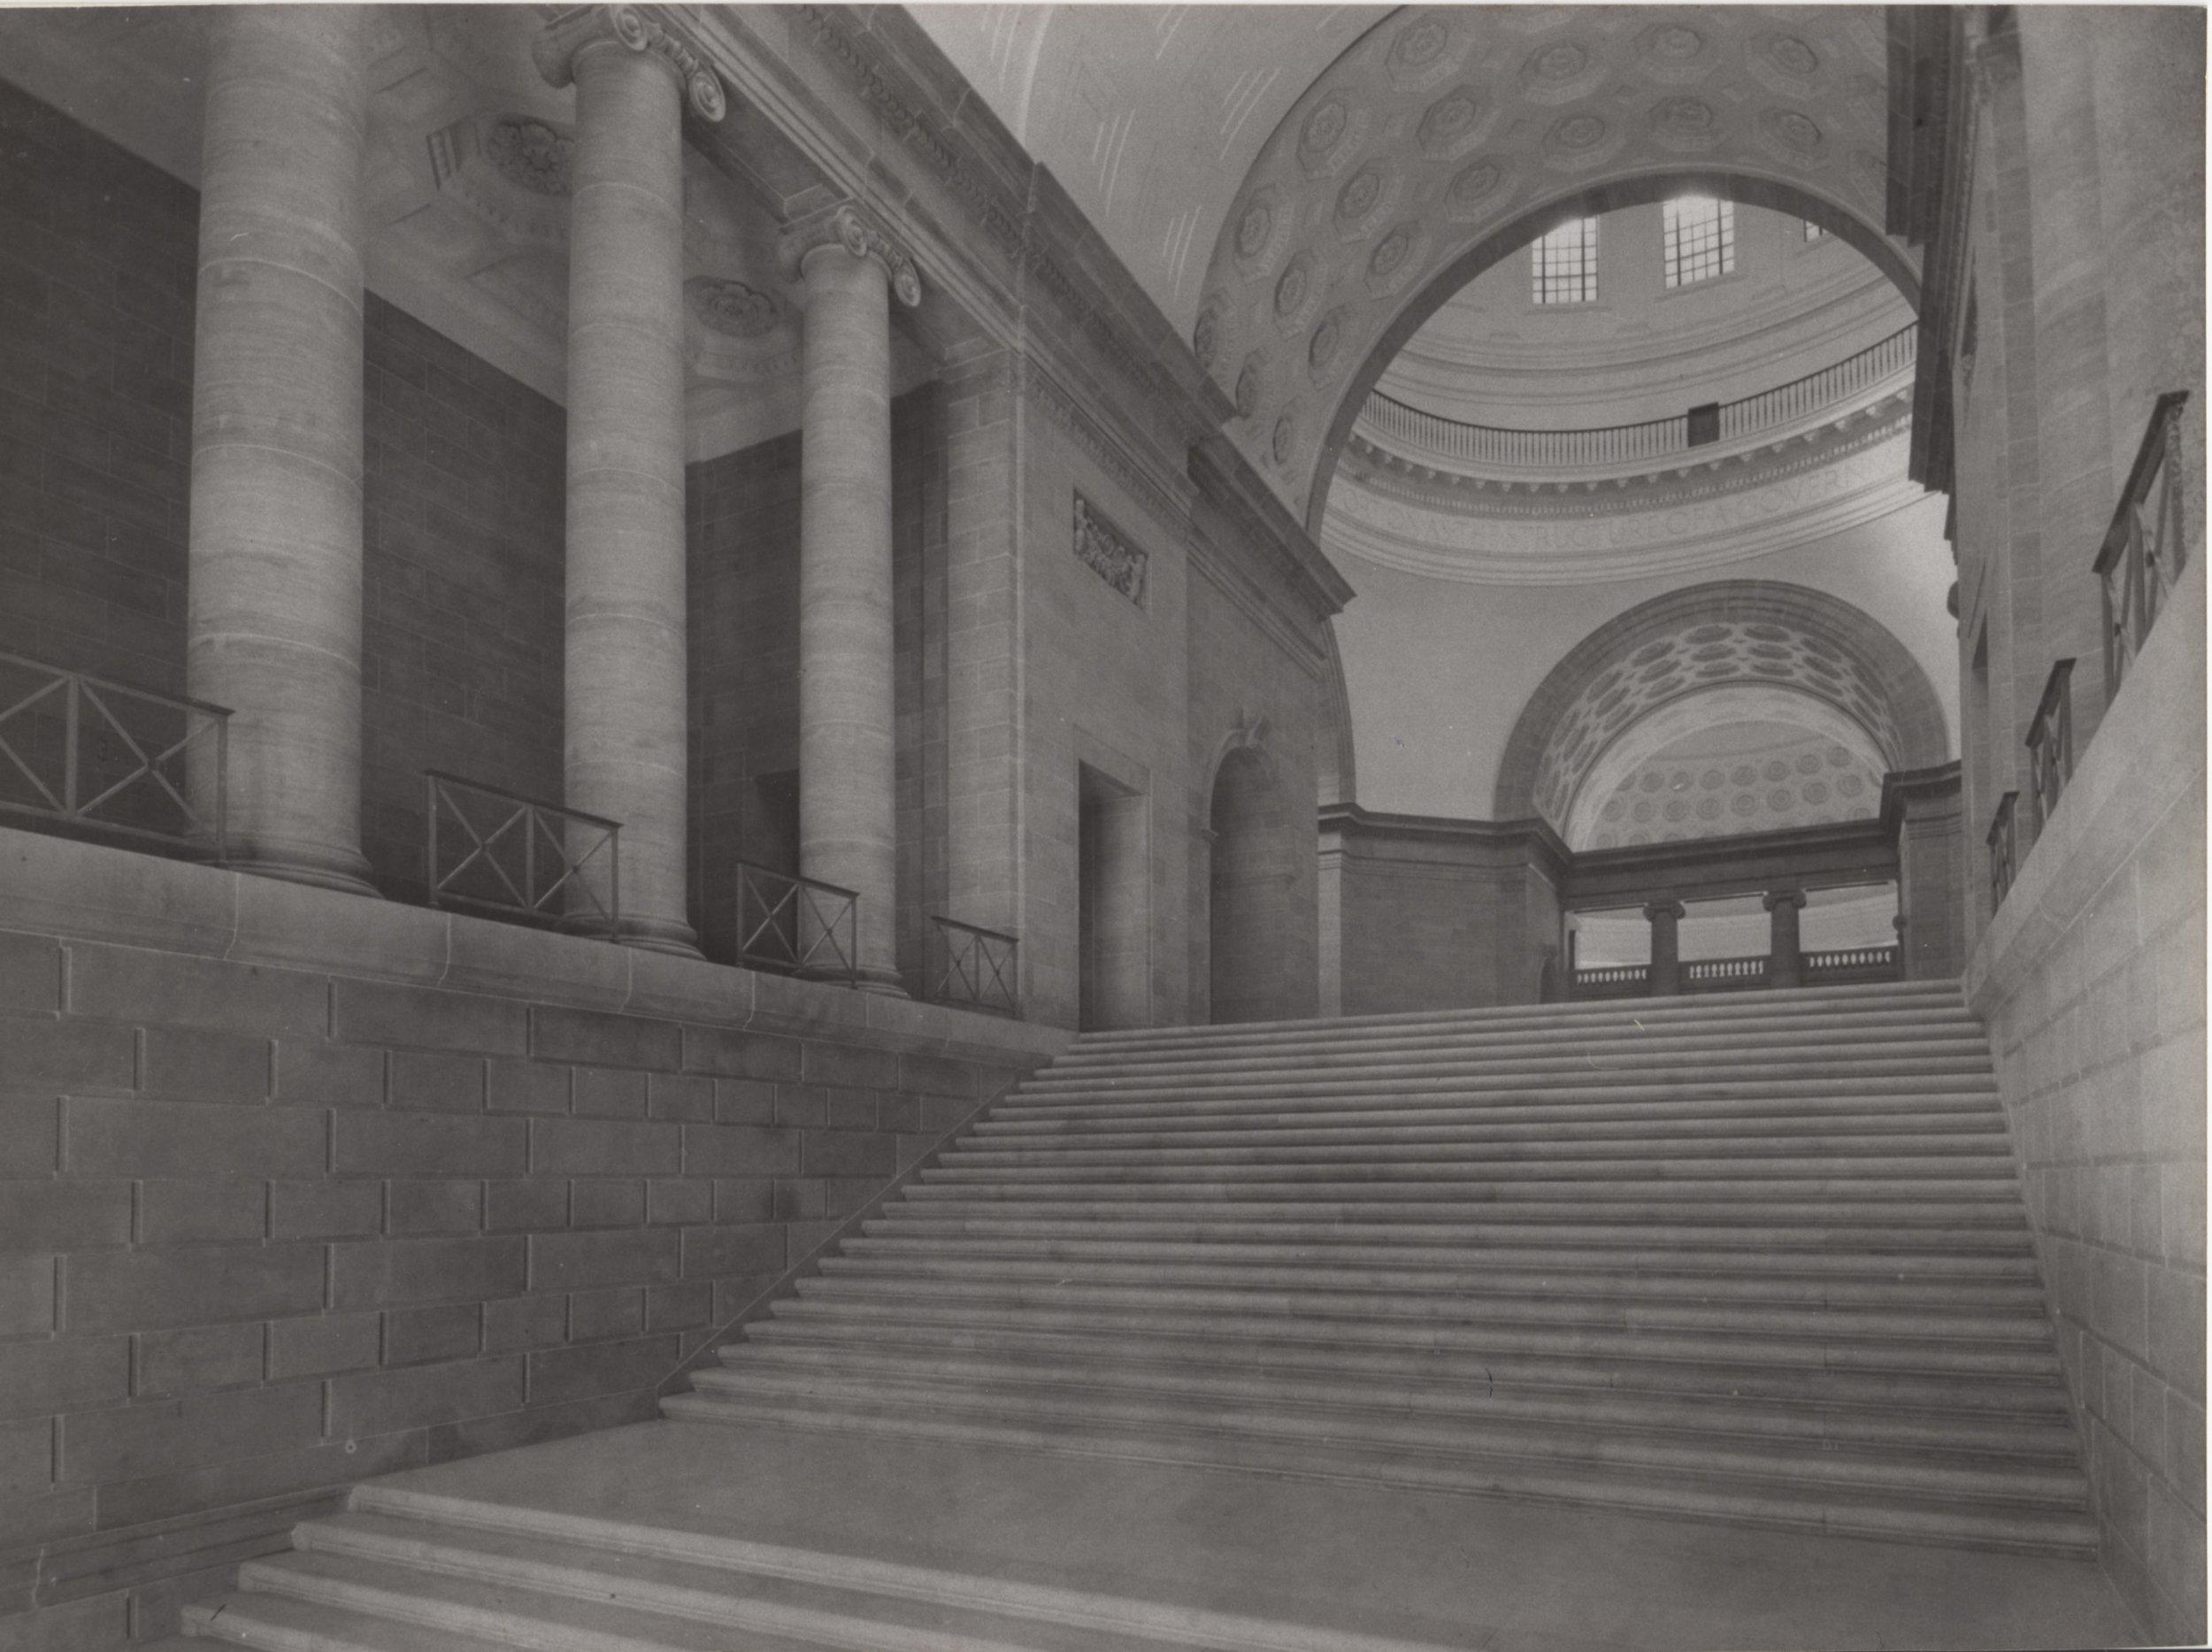 Capitol Rotunda, c. 1926